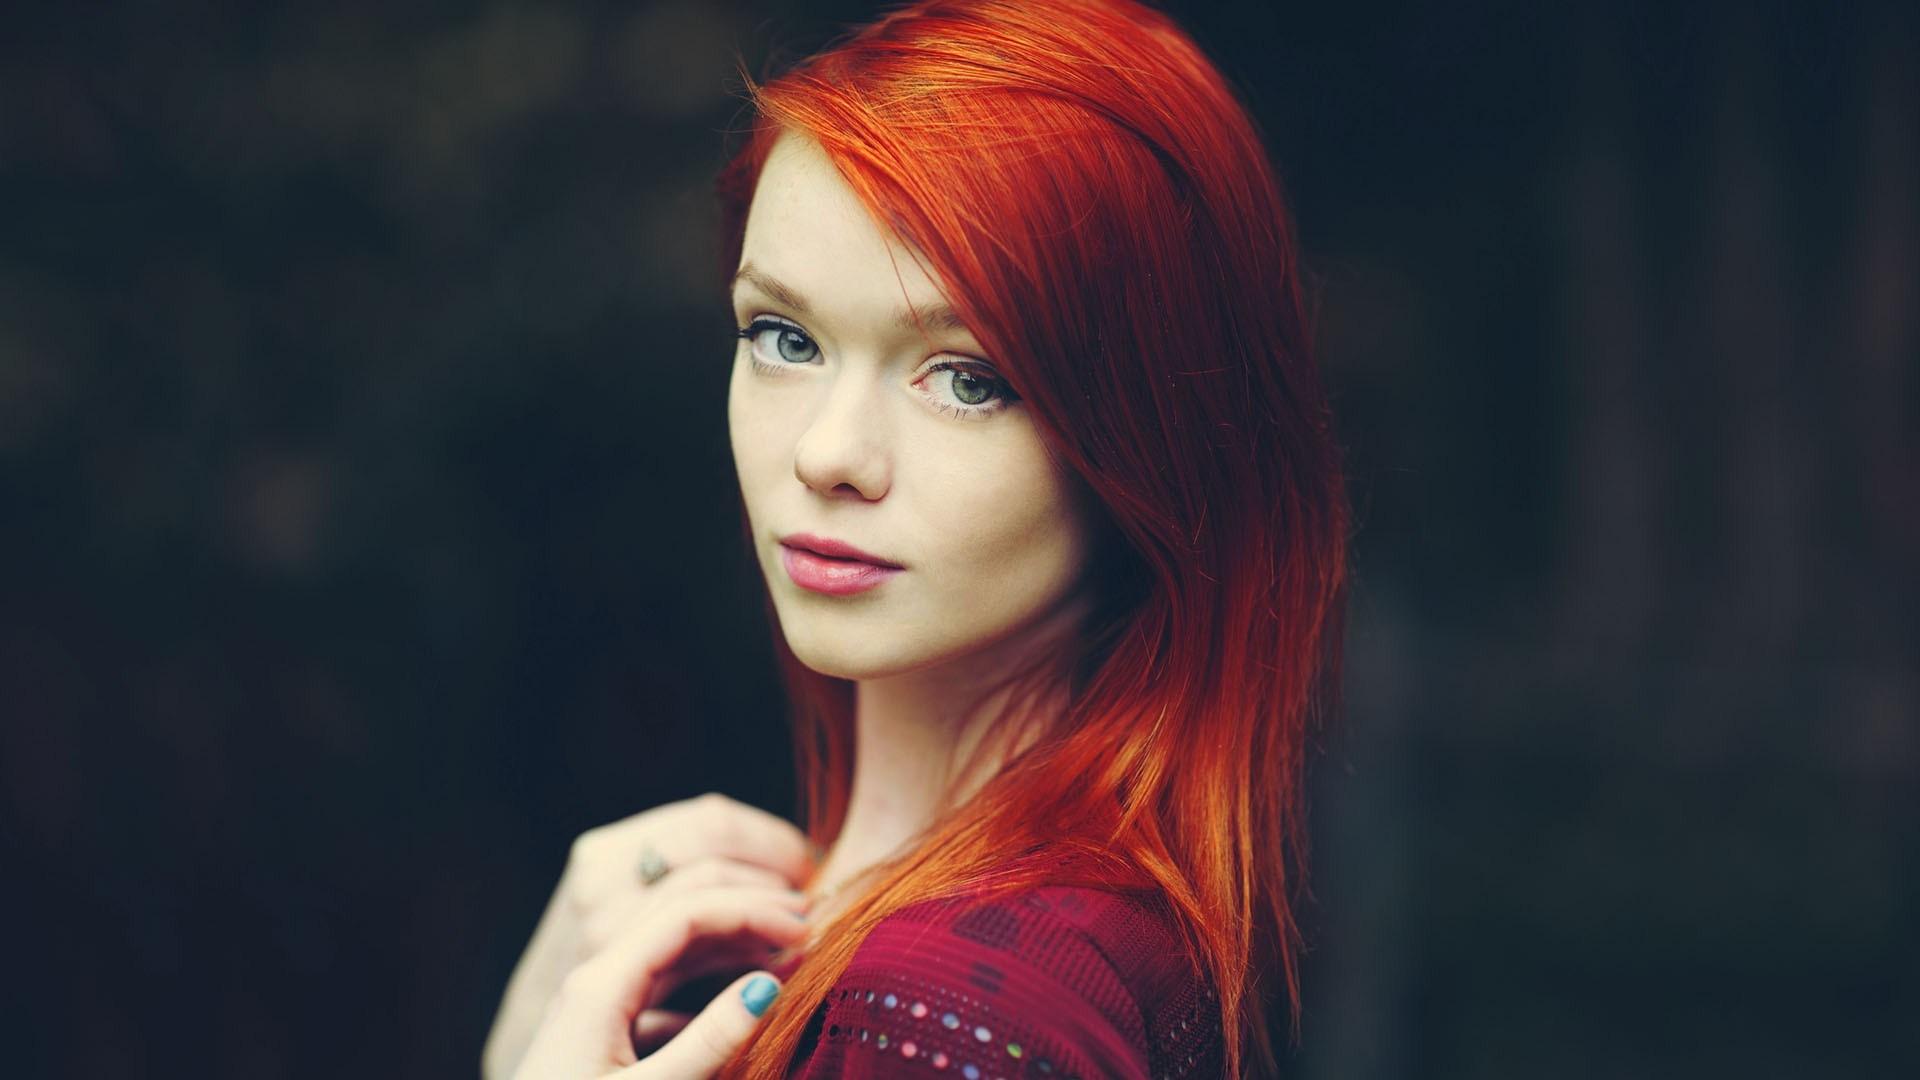 redhead wallpaper 20608